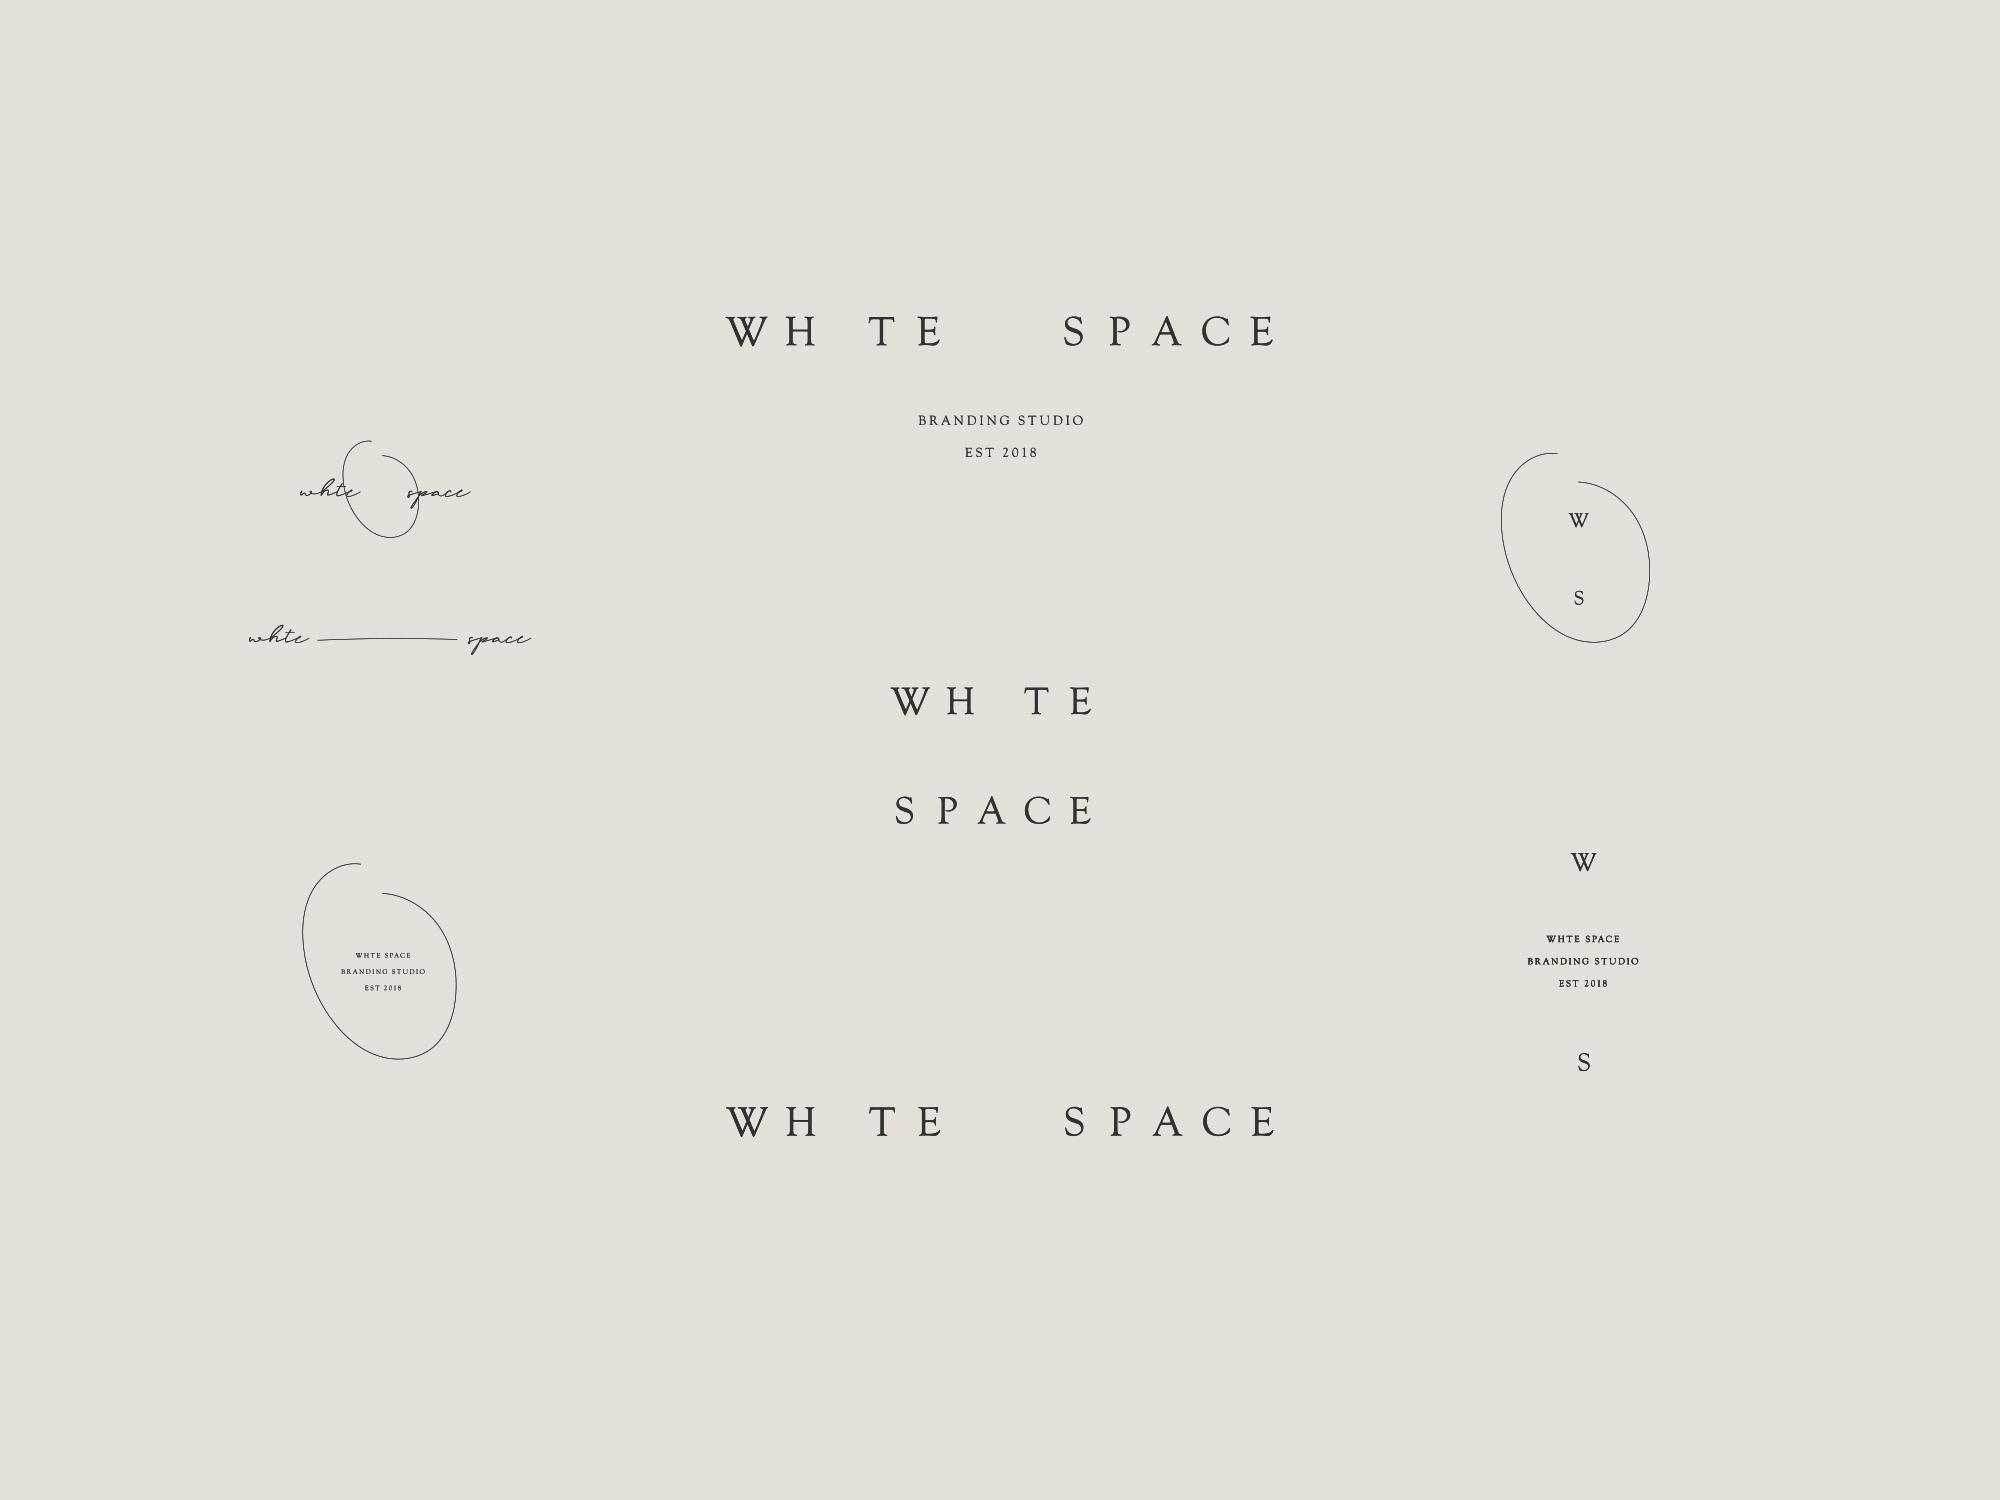 WhteSpace-1.jpg